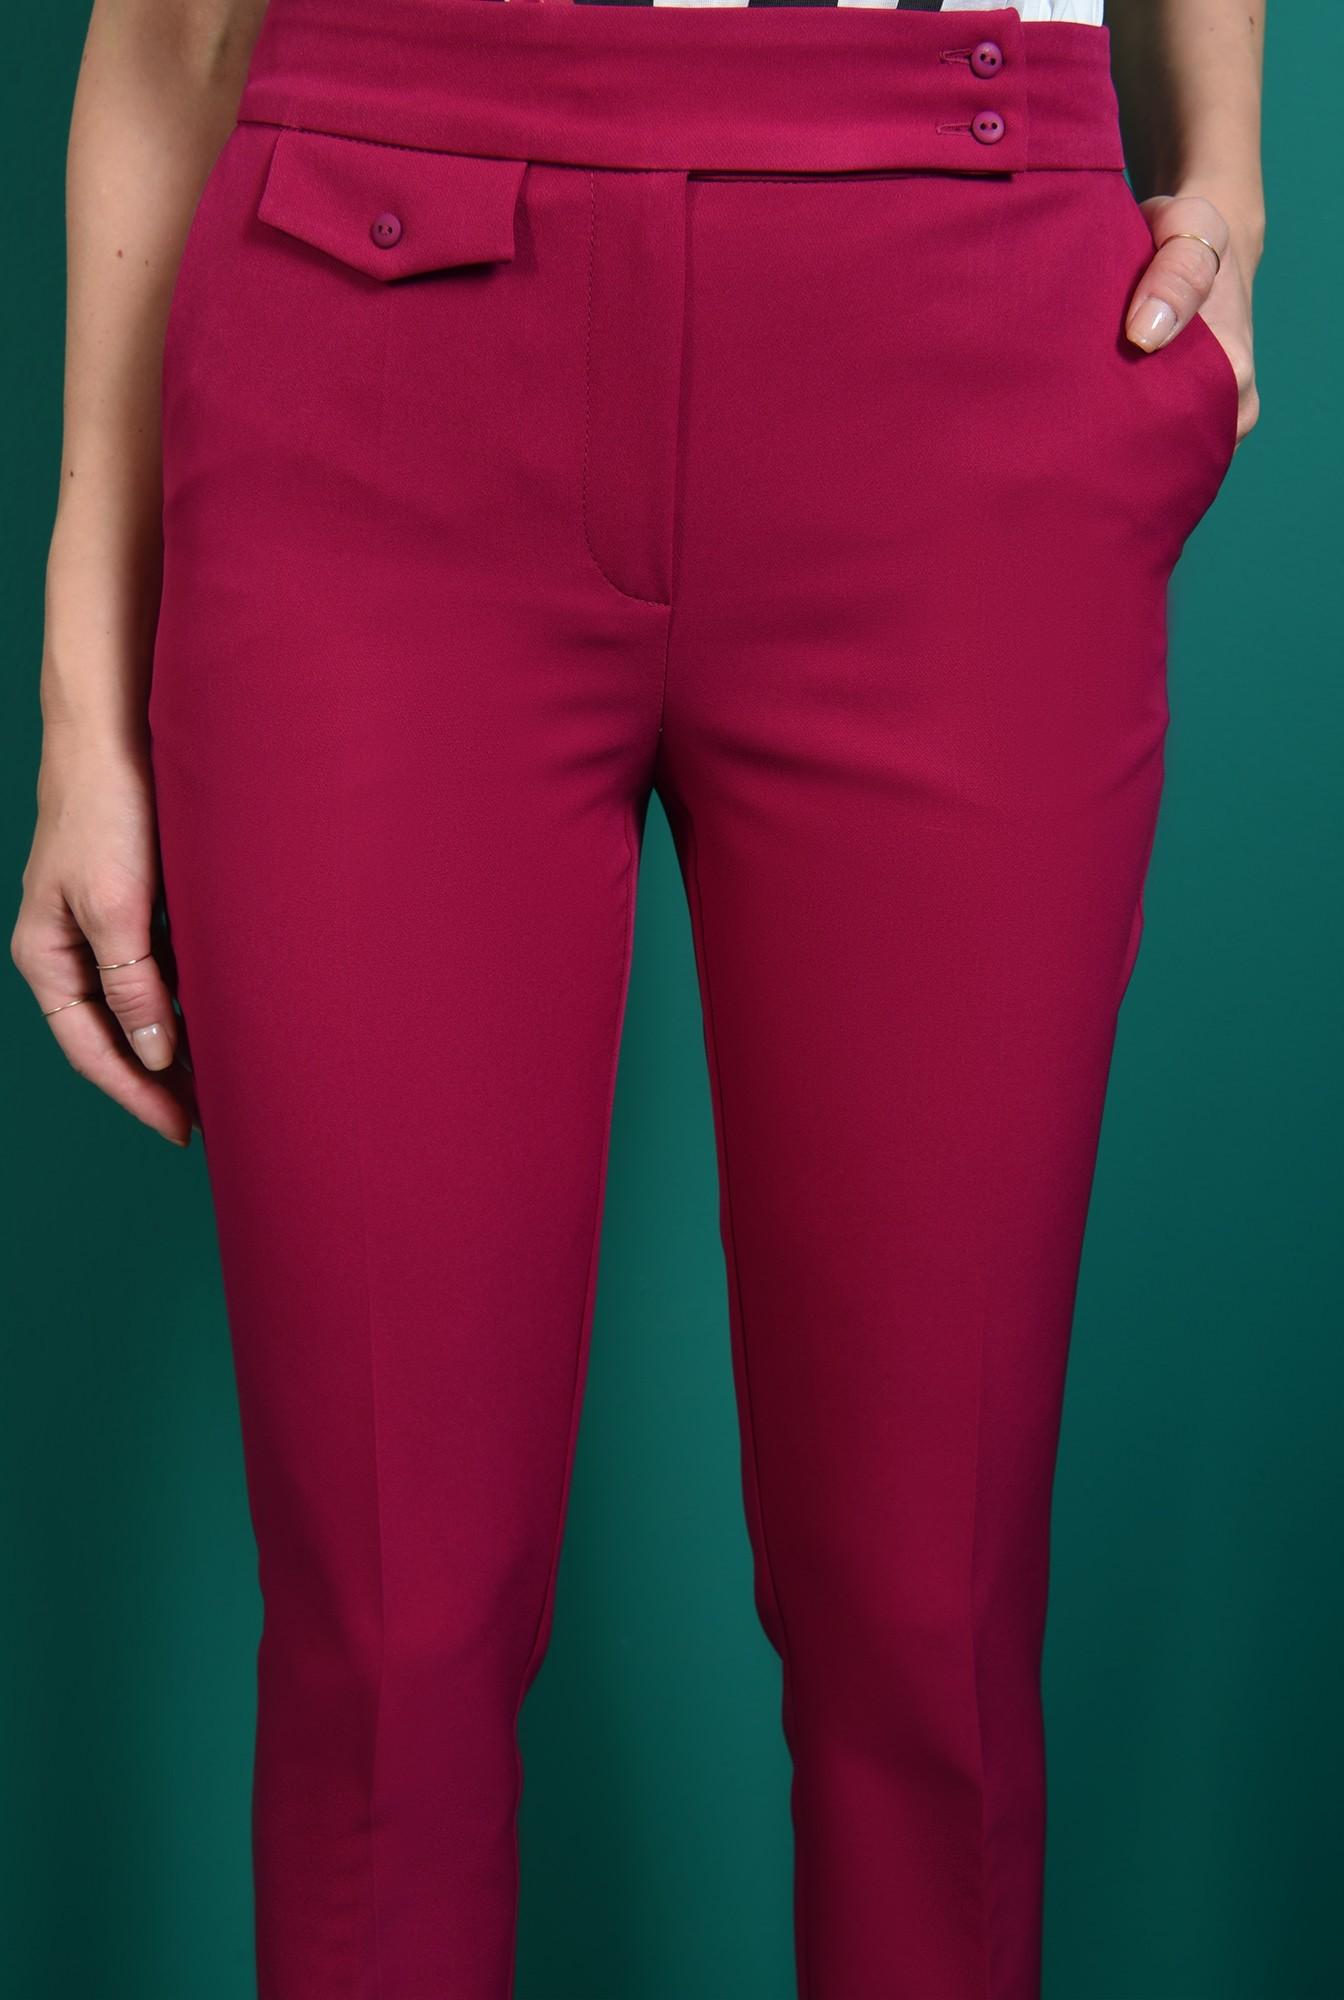 2 - pantaloni lungi, magenta, cu buzunar, Poema